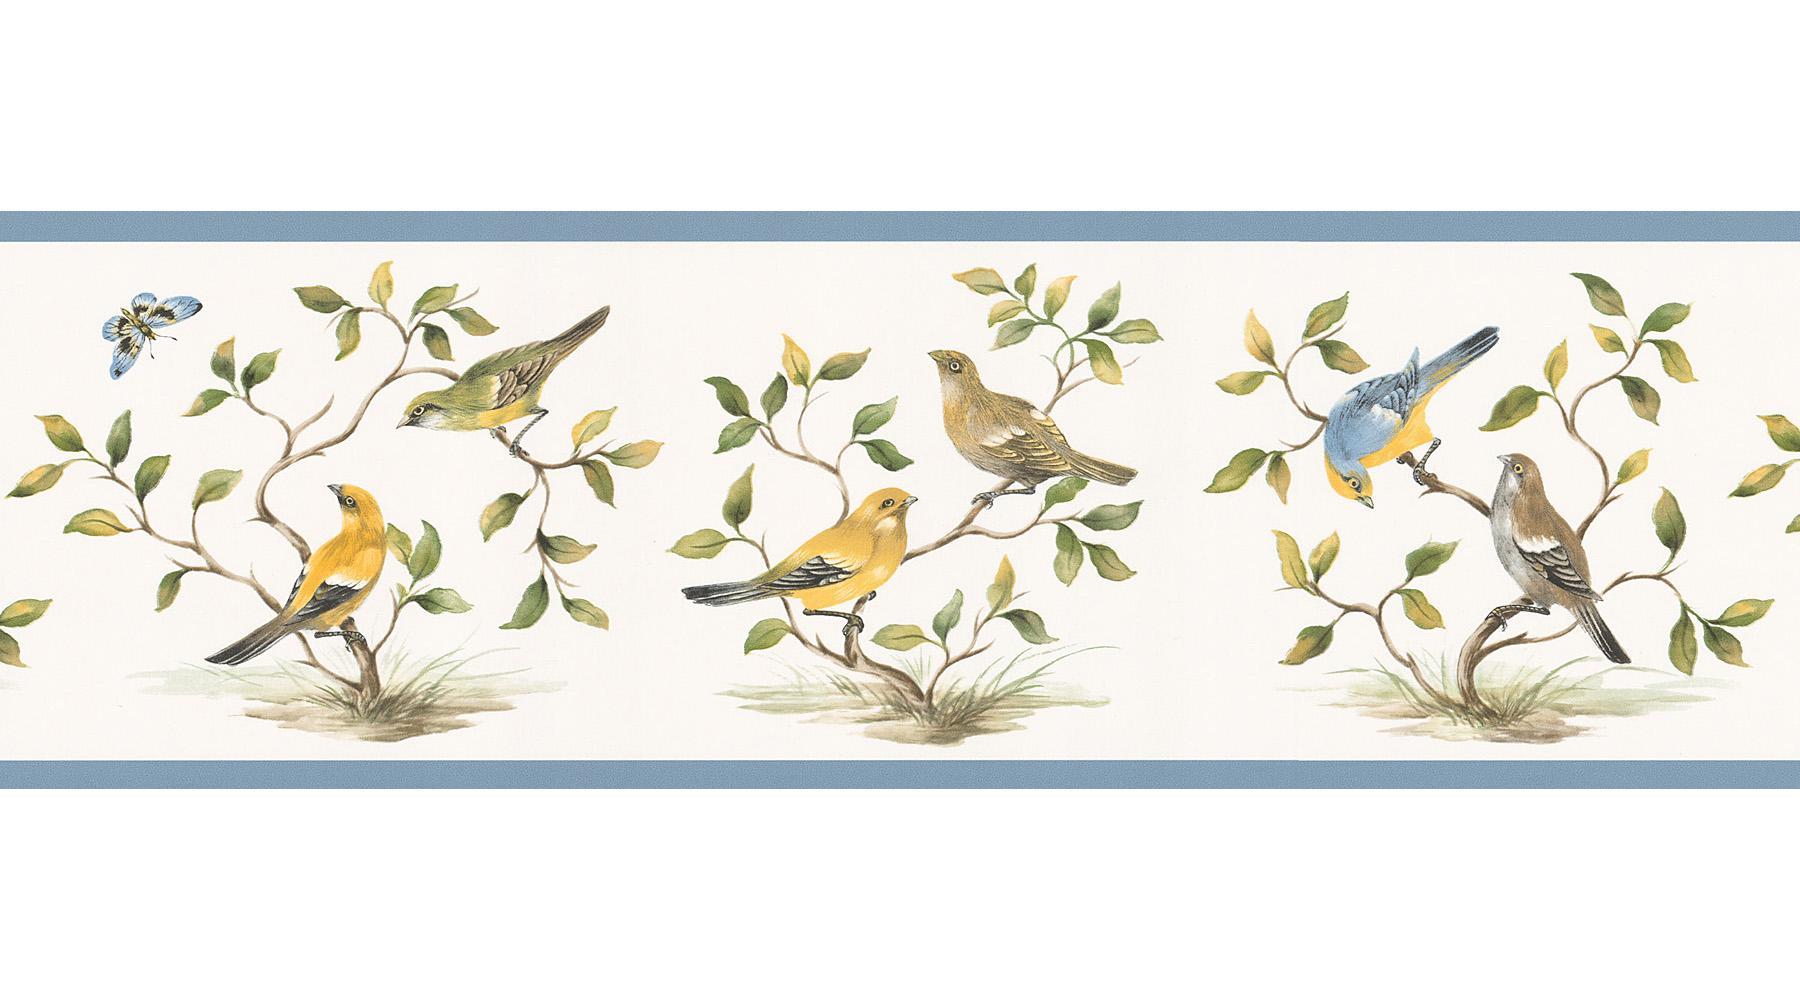 Bird wallpaper border hd wallpapers blog for Wallpaper borders